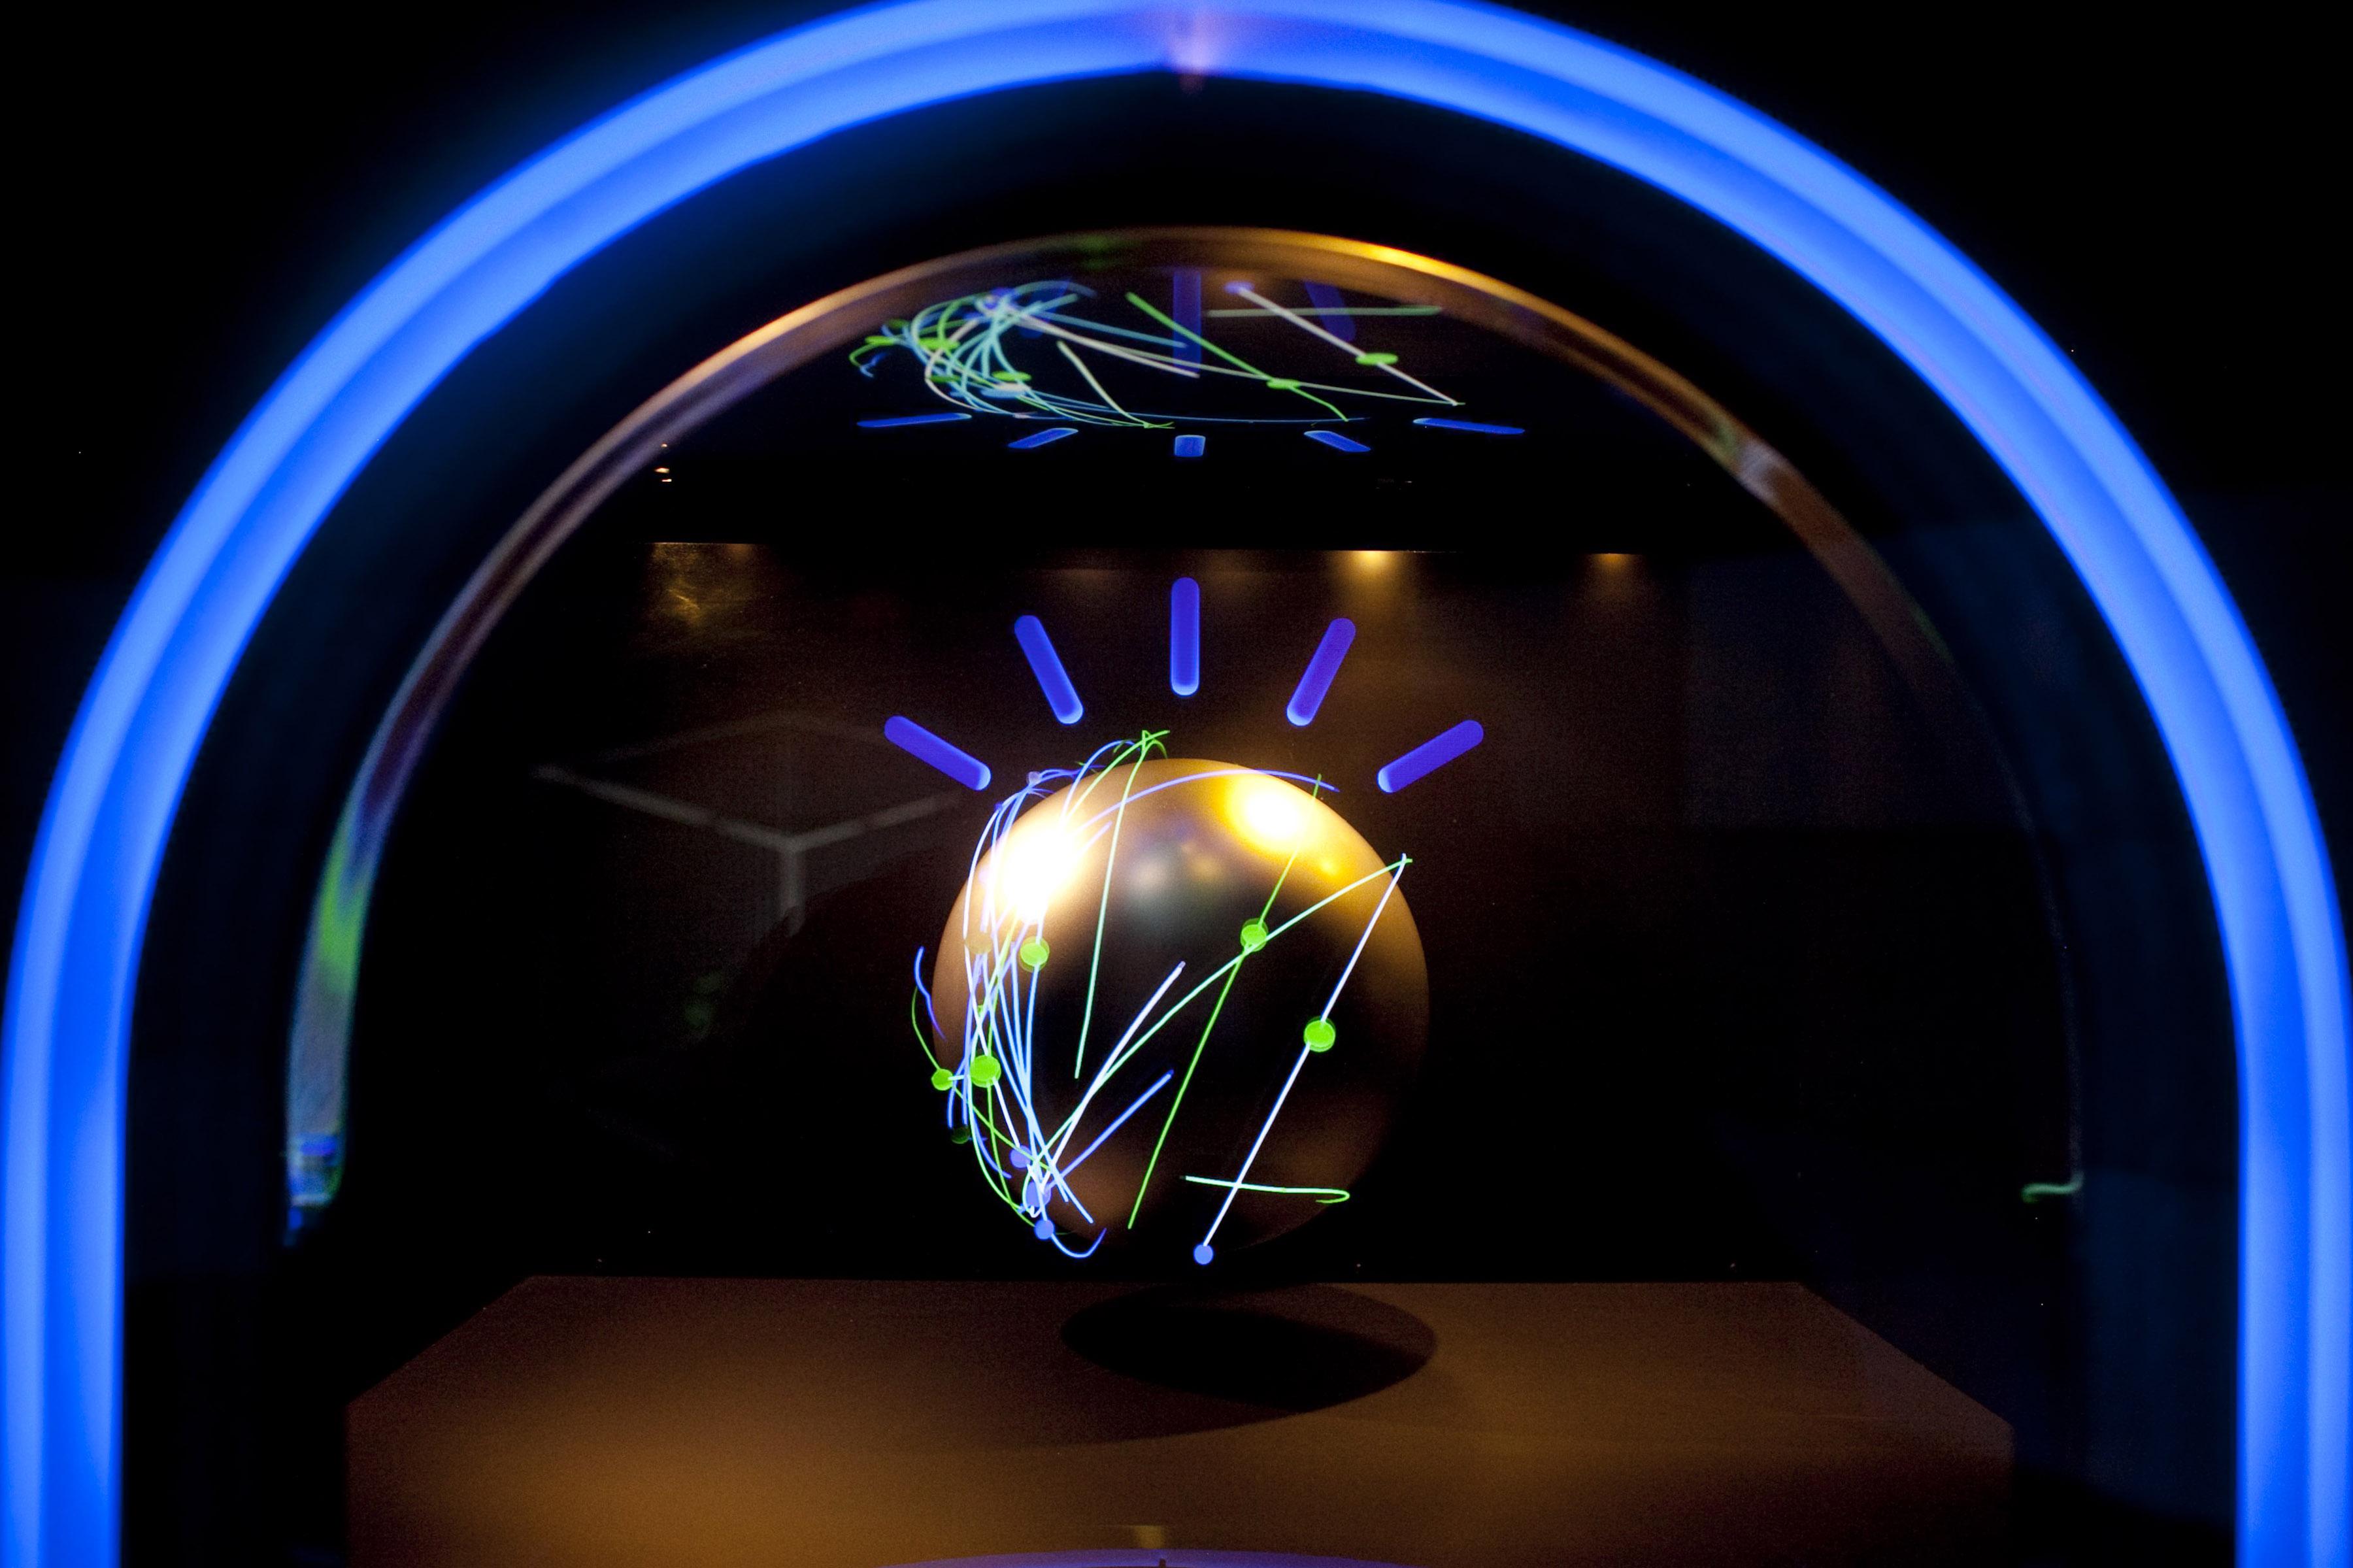 Watson computer at IBM in New York City